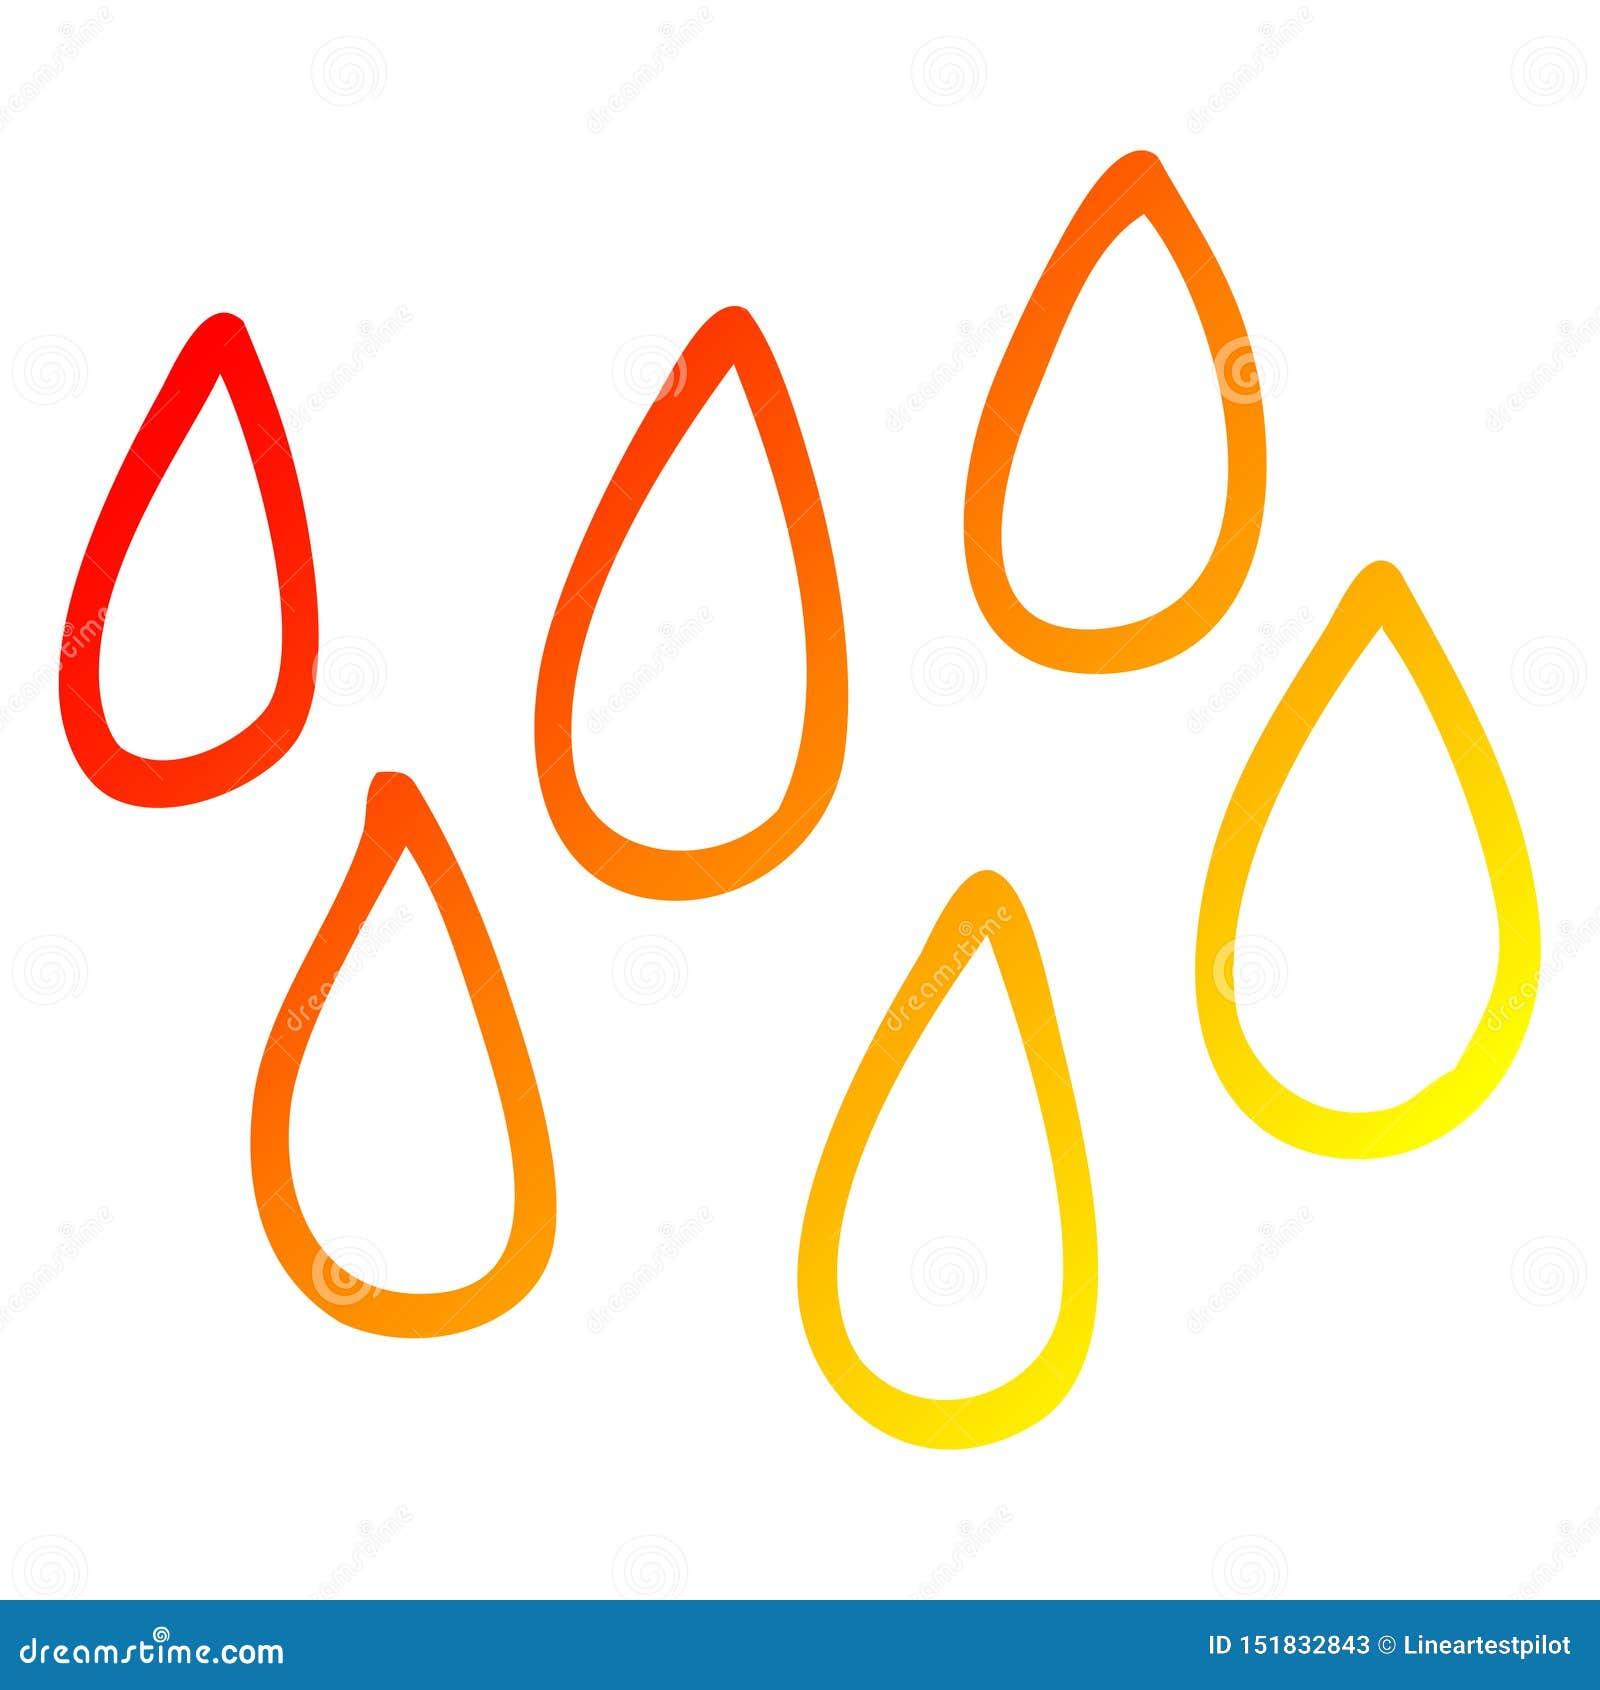 A creative warm gradient line drawing cartoon blood droplets